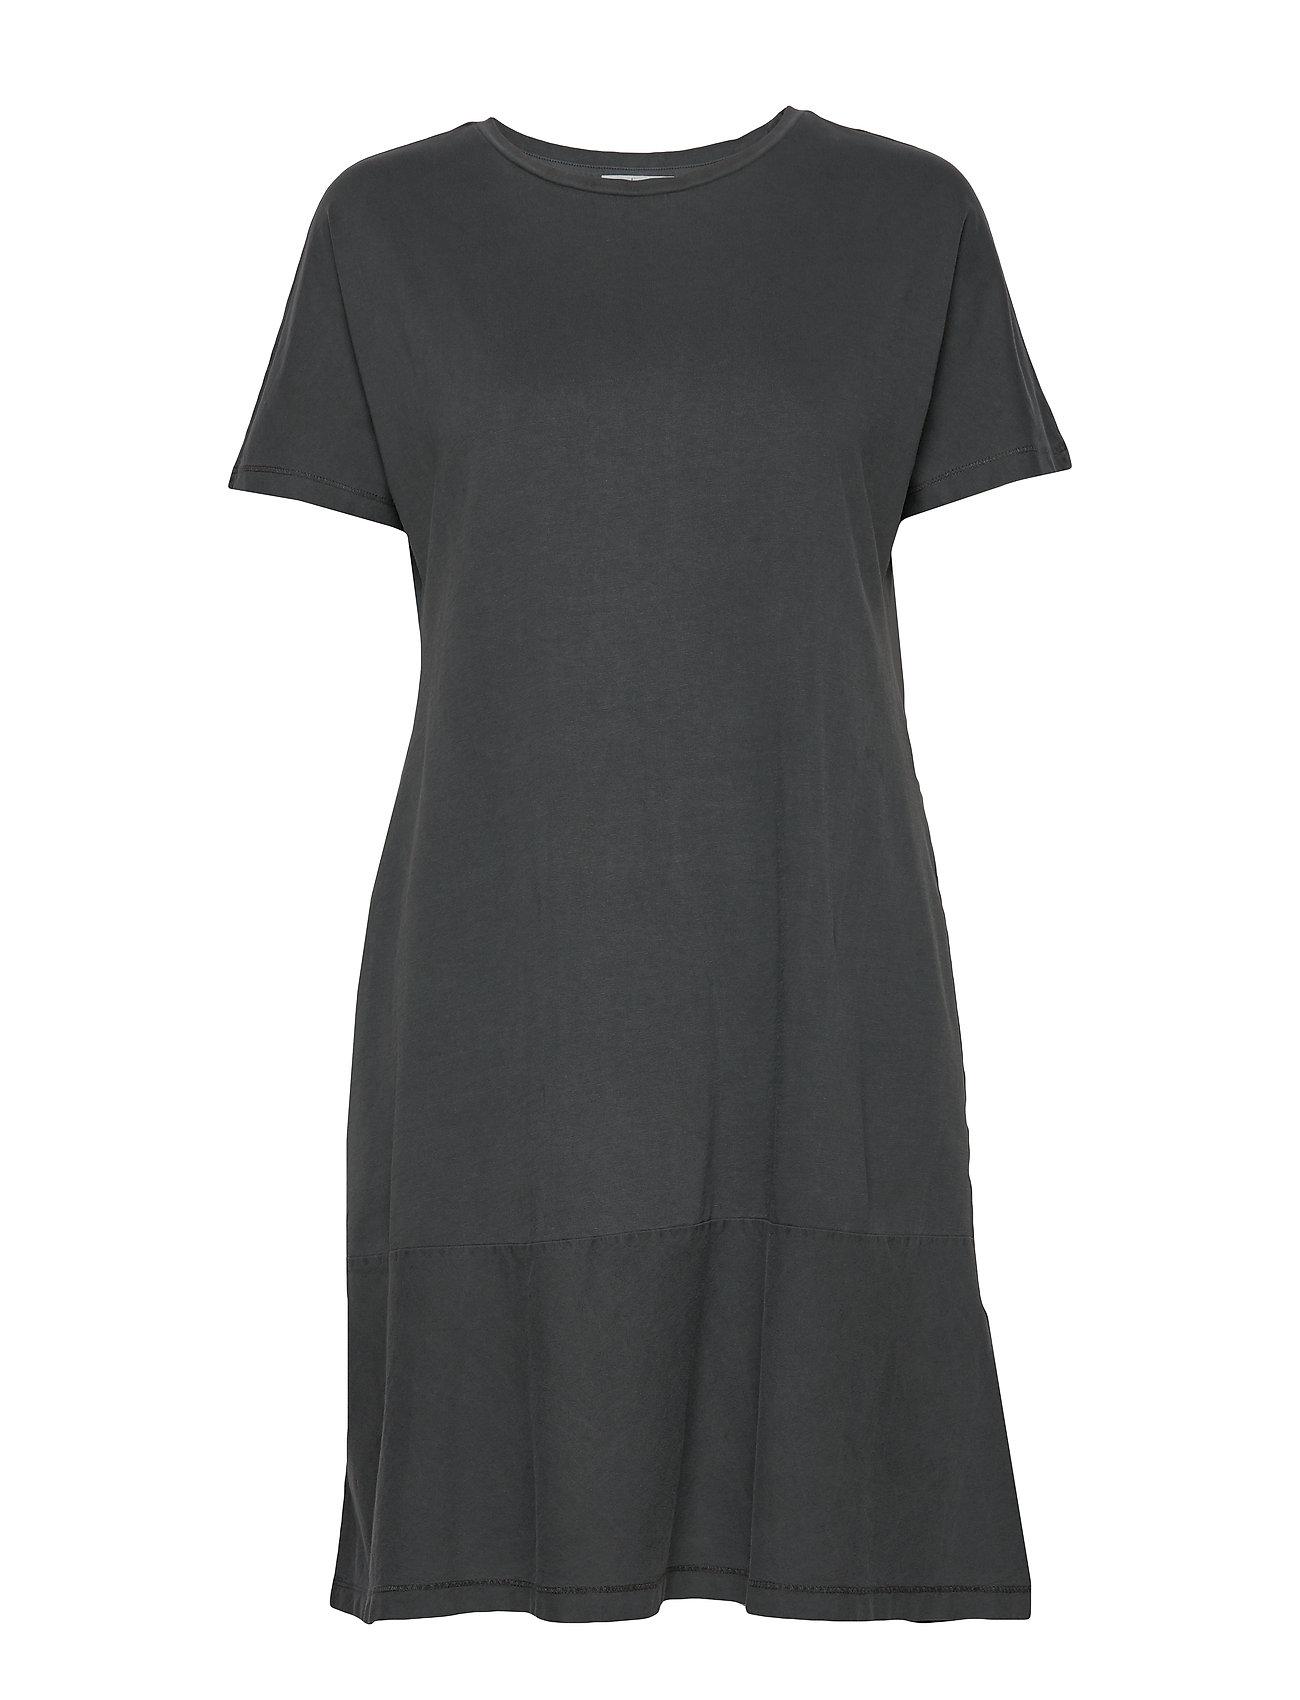 Image of Dresses Knitted Kort Kjole Grå EDC By Esprit (3360909189)